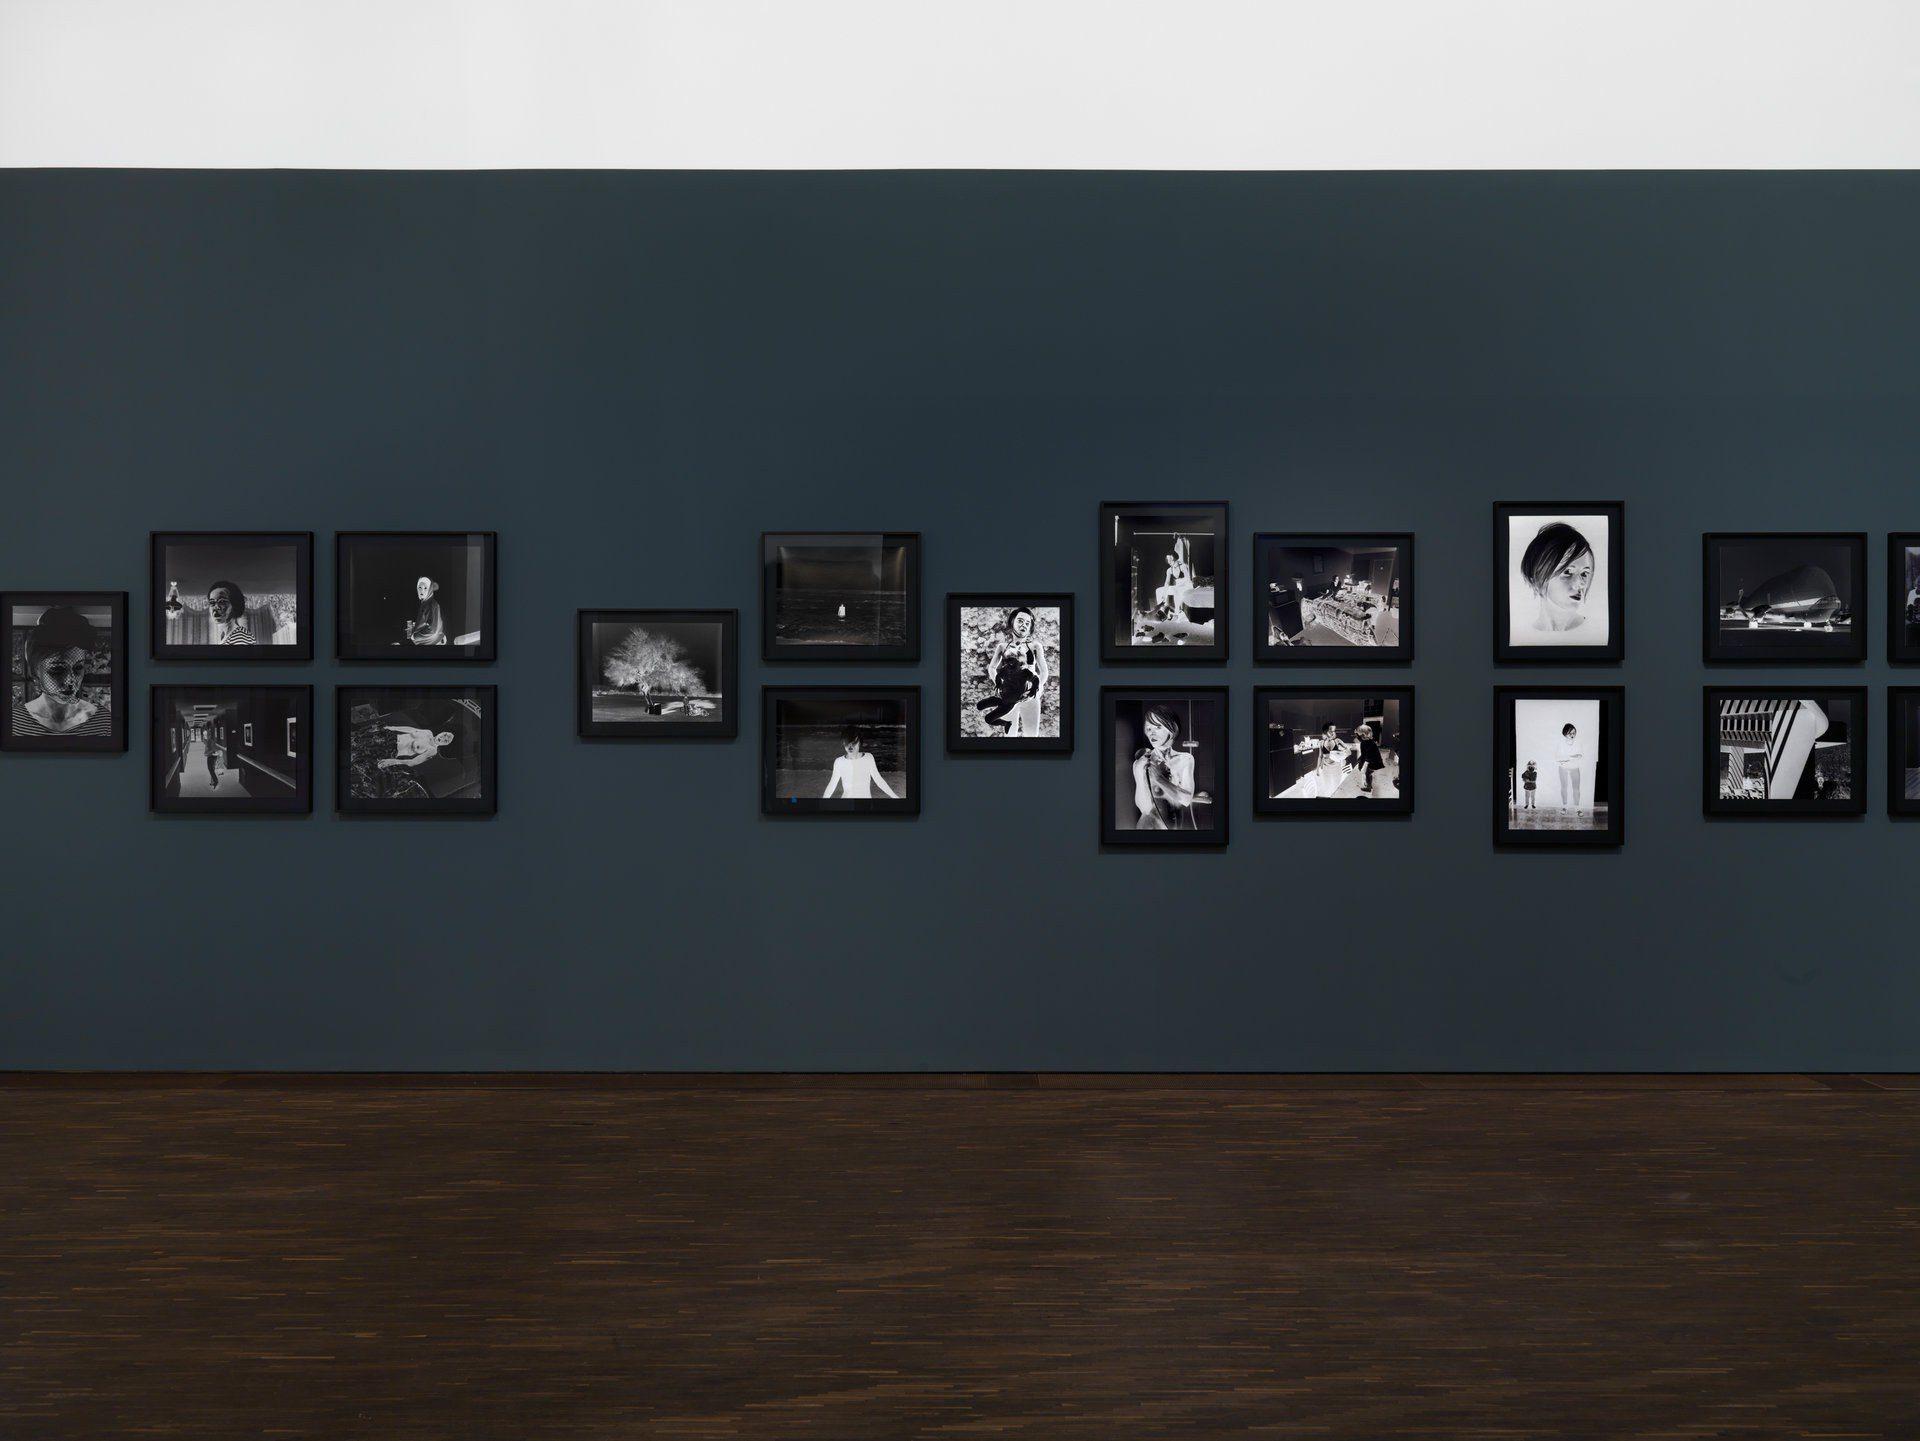 Aneta Grzeszykowska, Negative Book, 2012–2013, 'Fragile Sense of Hope' me Collectors Room, Berlin, Foto: Bernd Borchardt